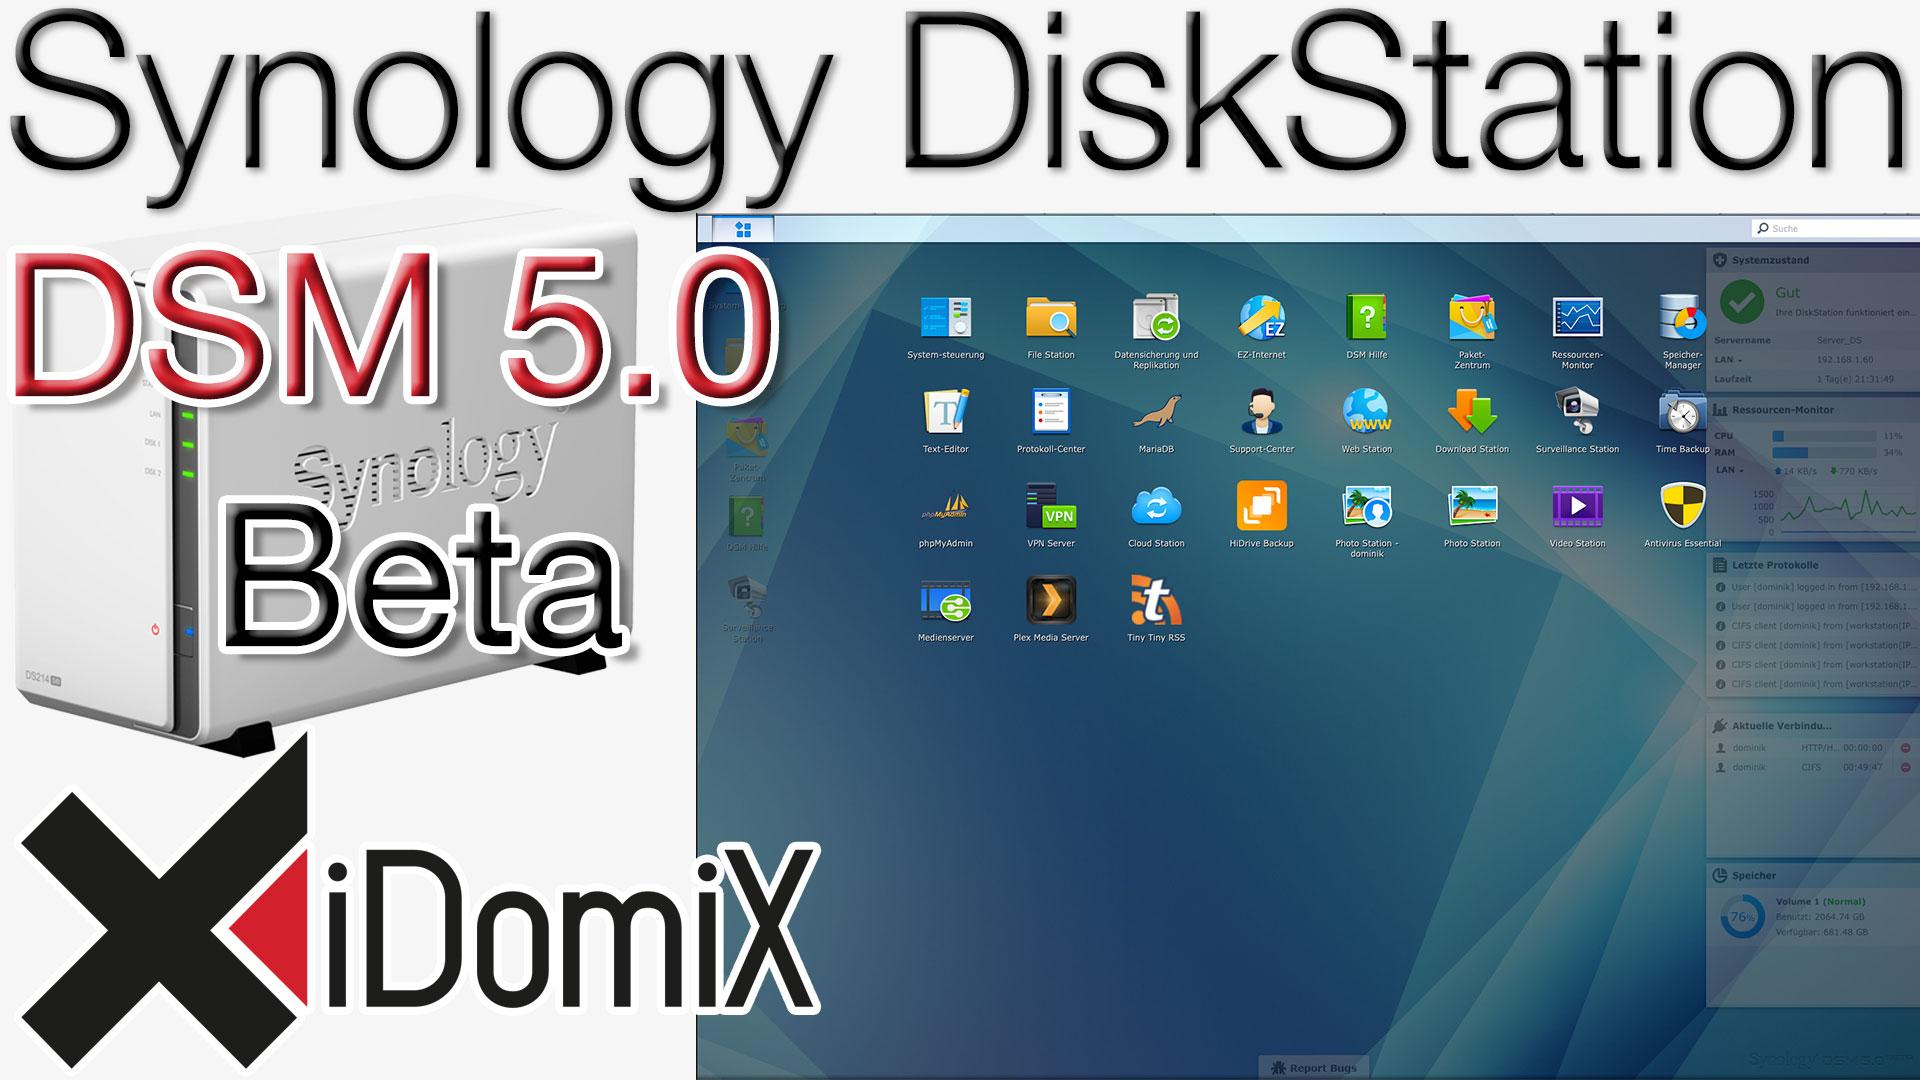 Synology DiskStation DSM 5.0 Beta kurzer Überblick